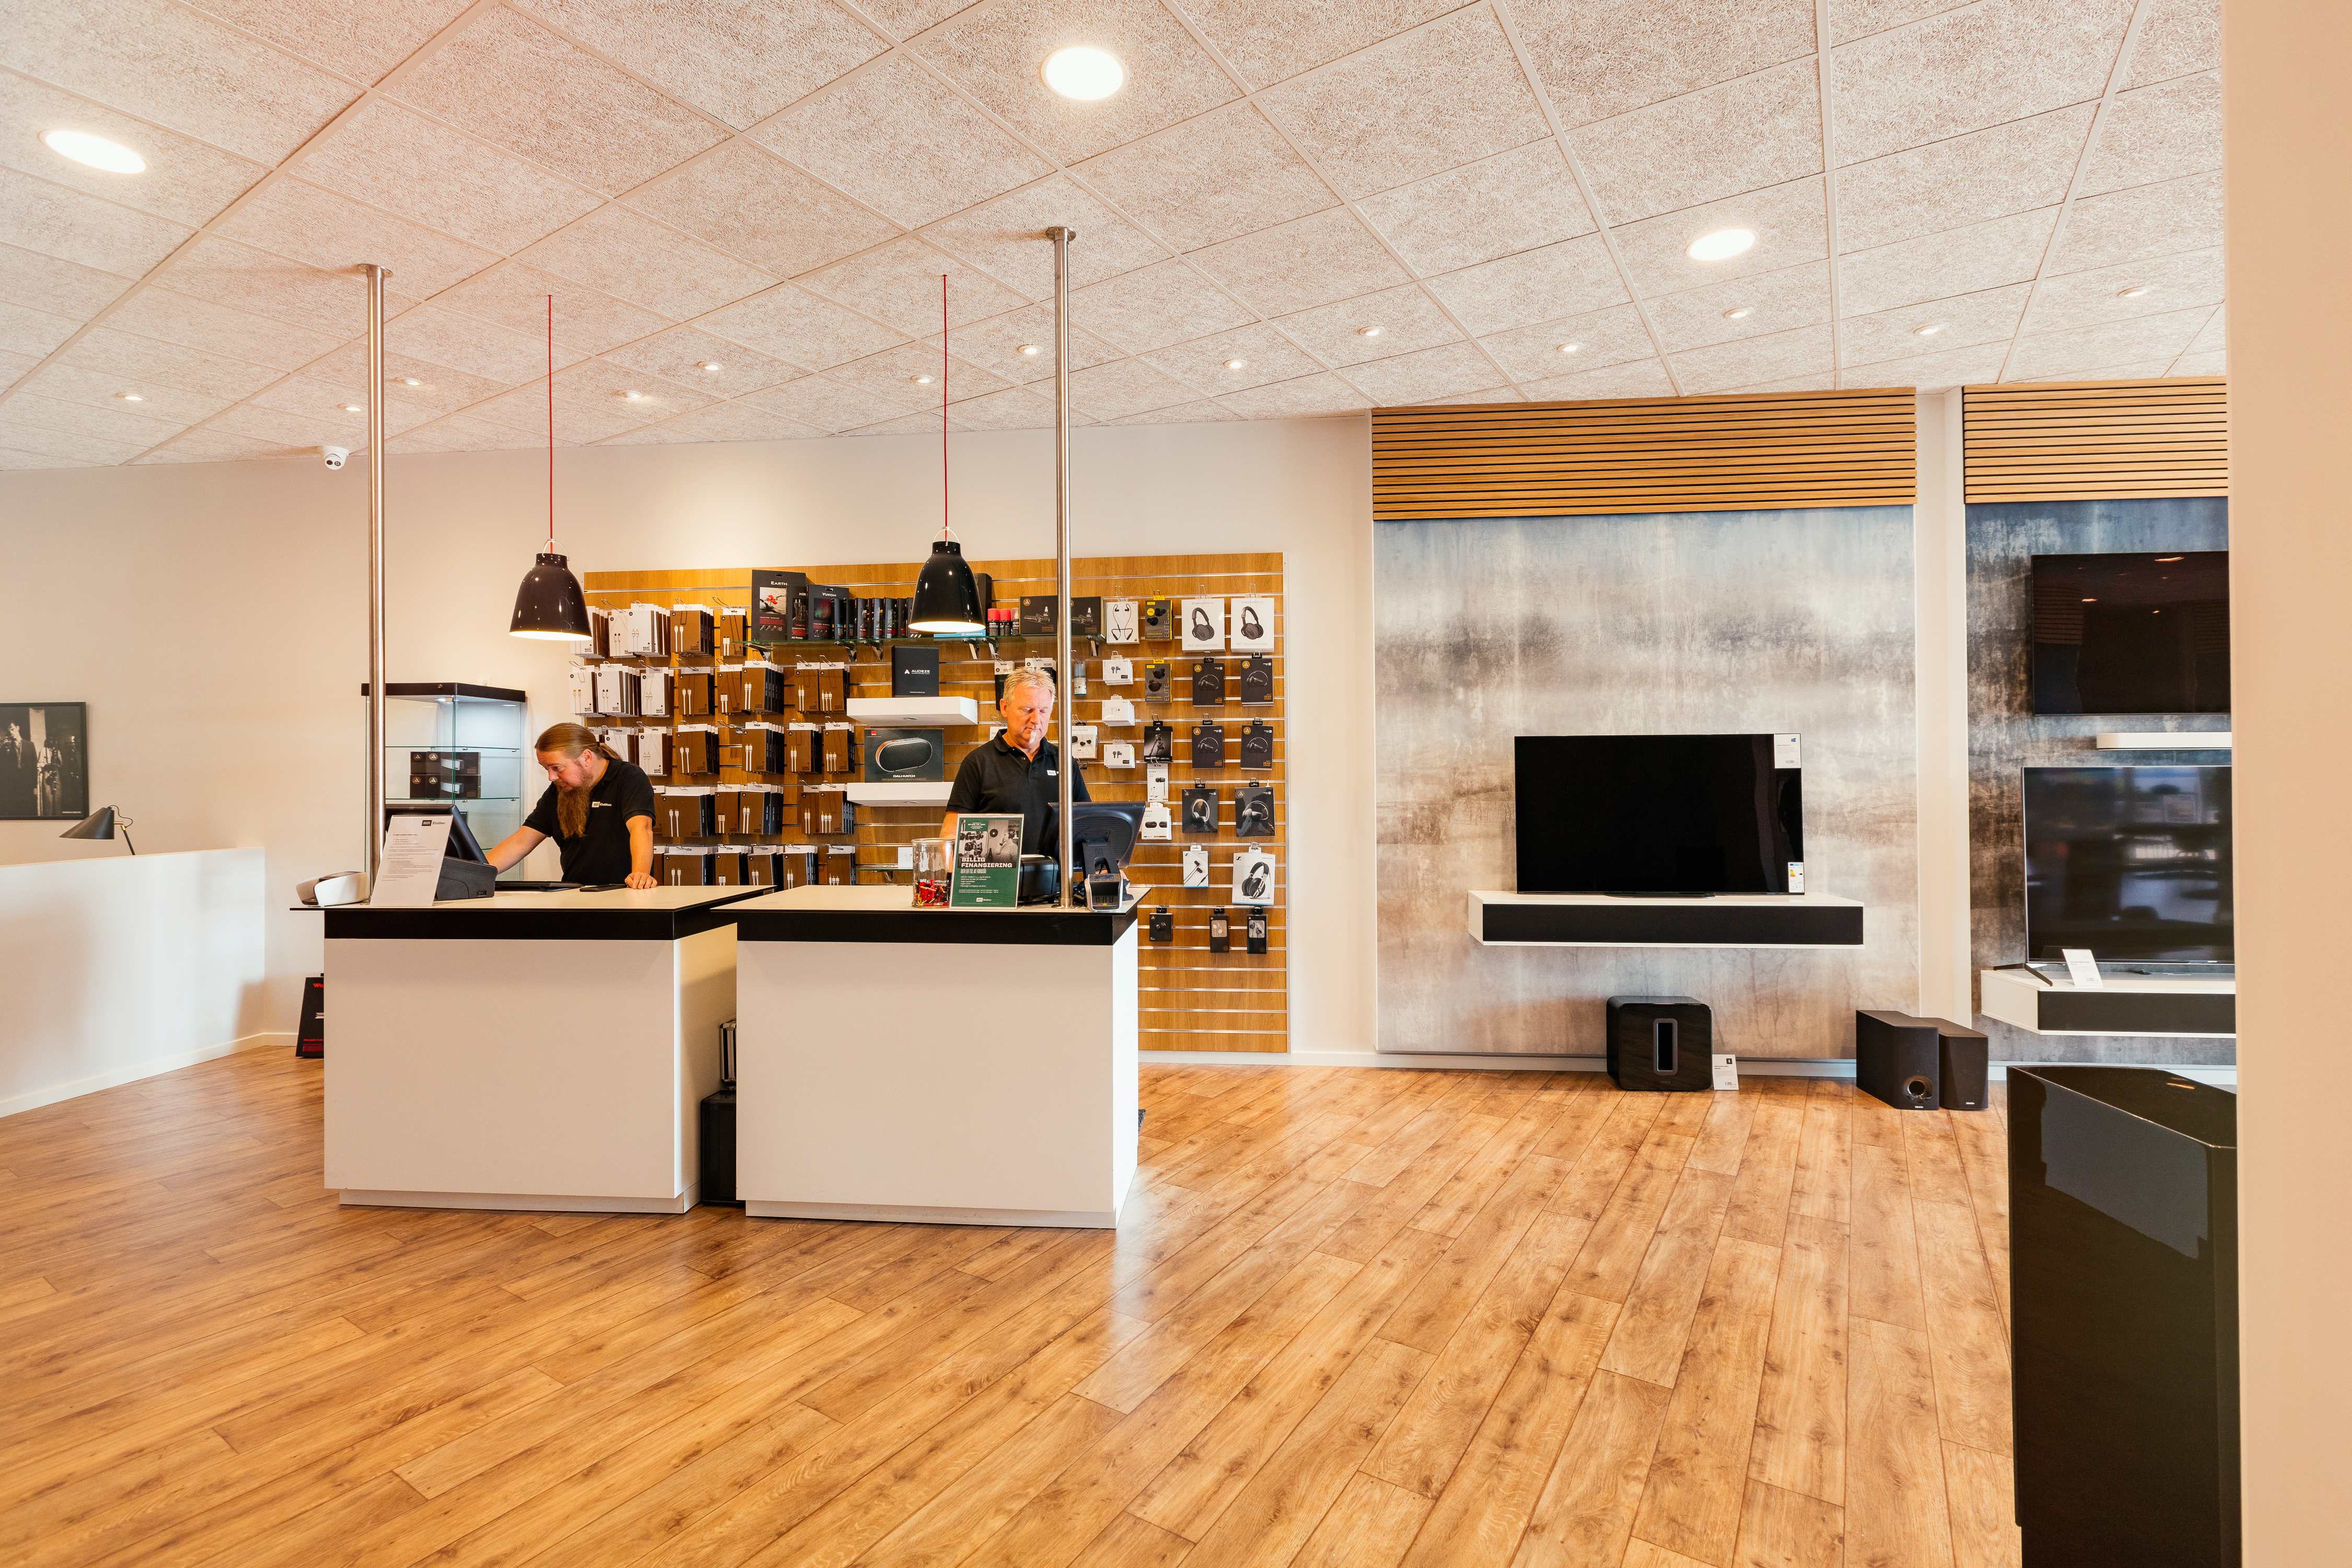 Ny-butik_Aalborg (5).jpg